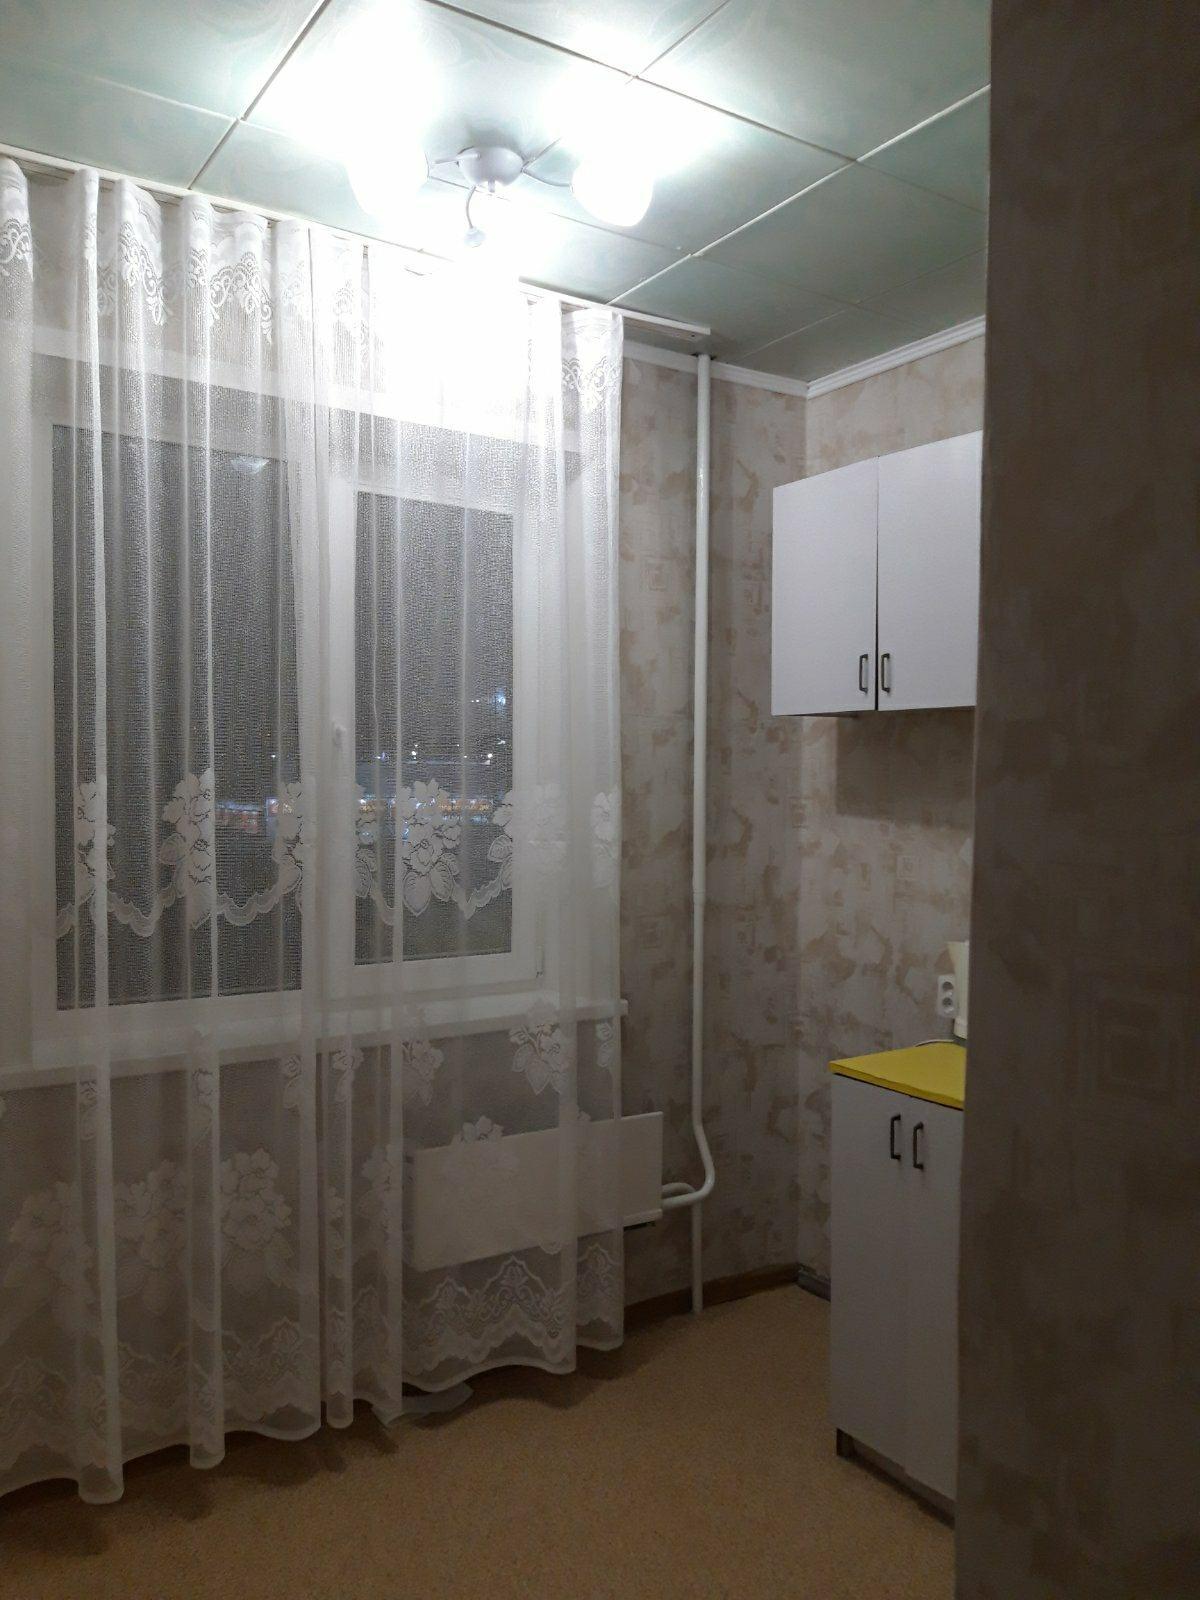 1к квартира проспект Металлургов, 4 | 12500 | аренда в Красноярске фото 3